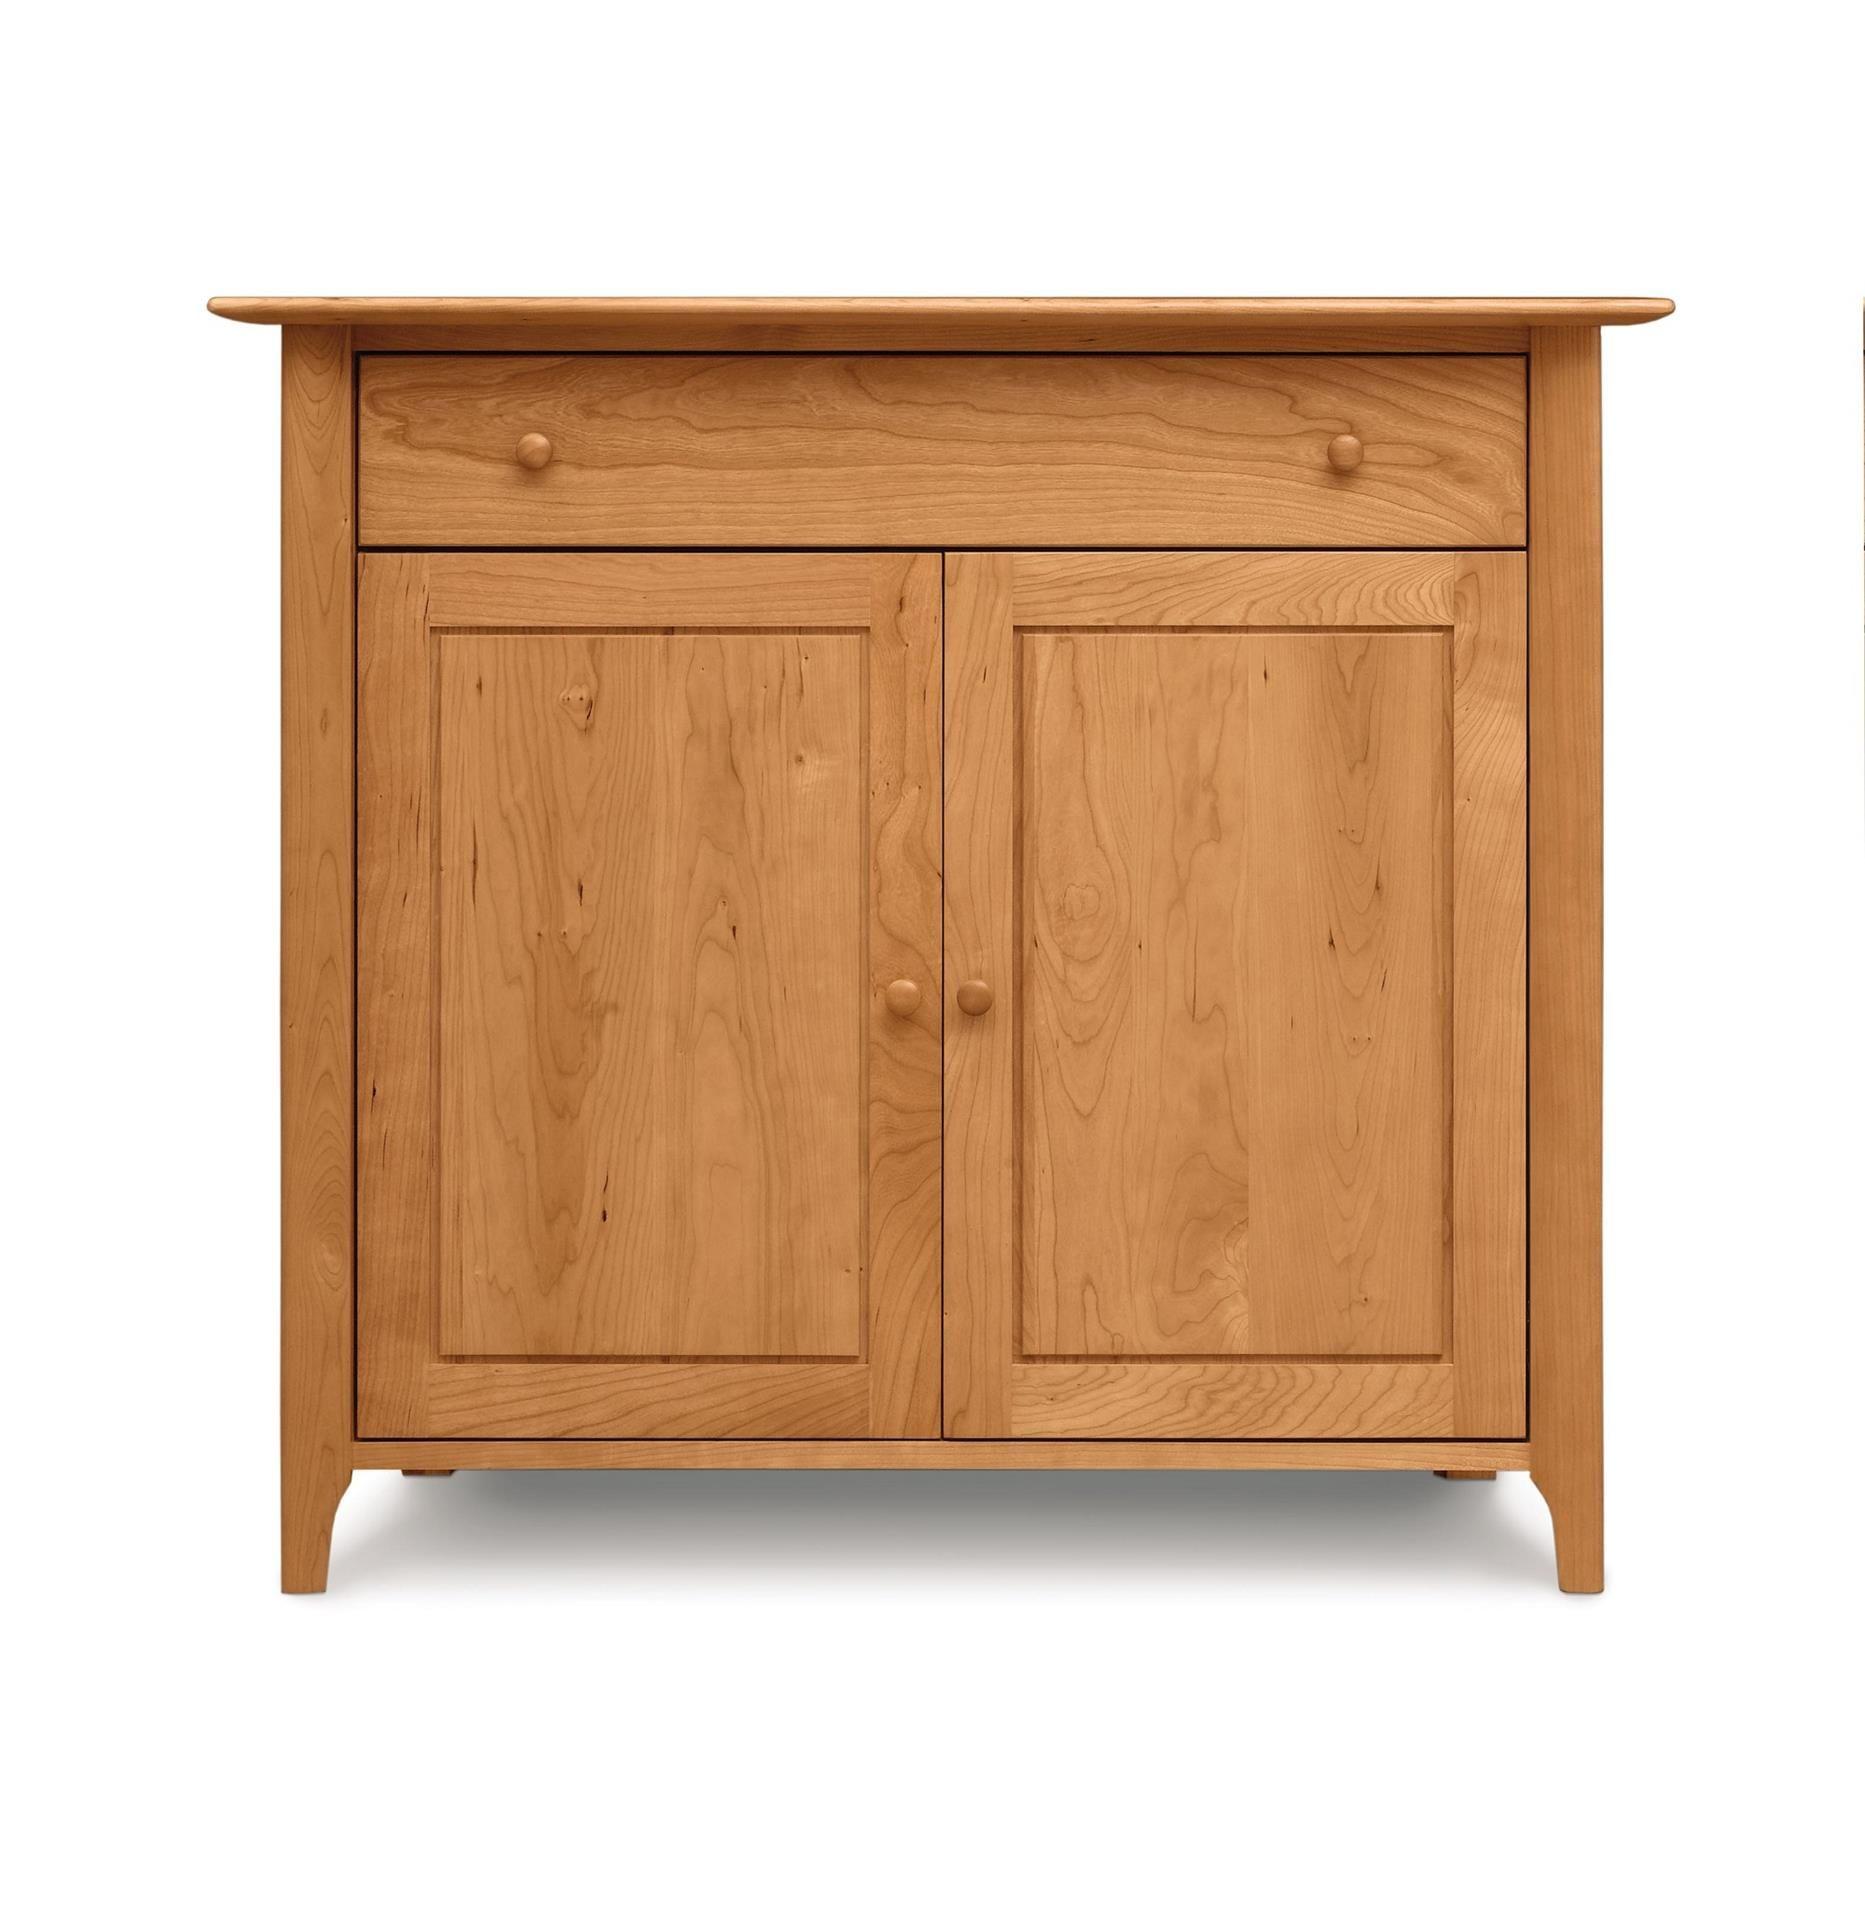 Copeland Sarah 1 Drawer Over 2 Door Buffet